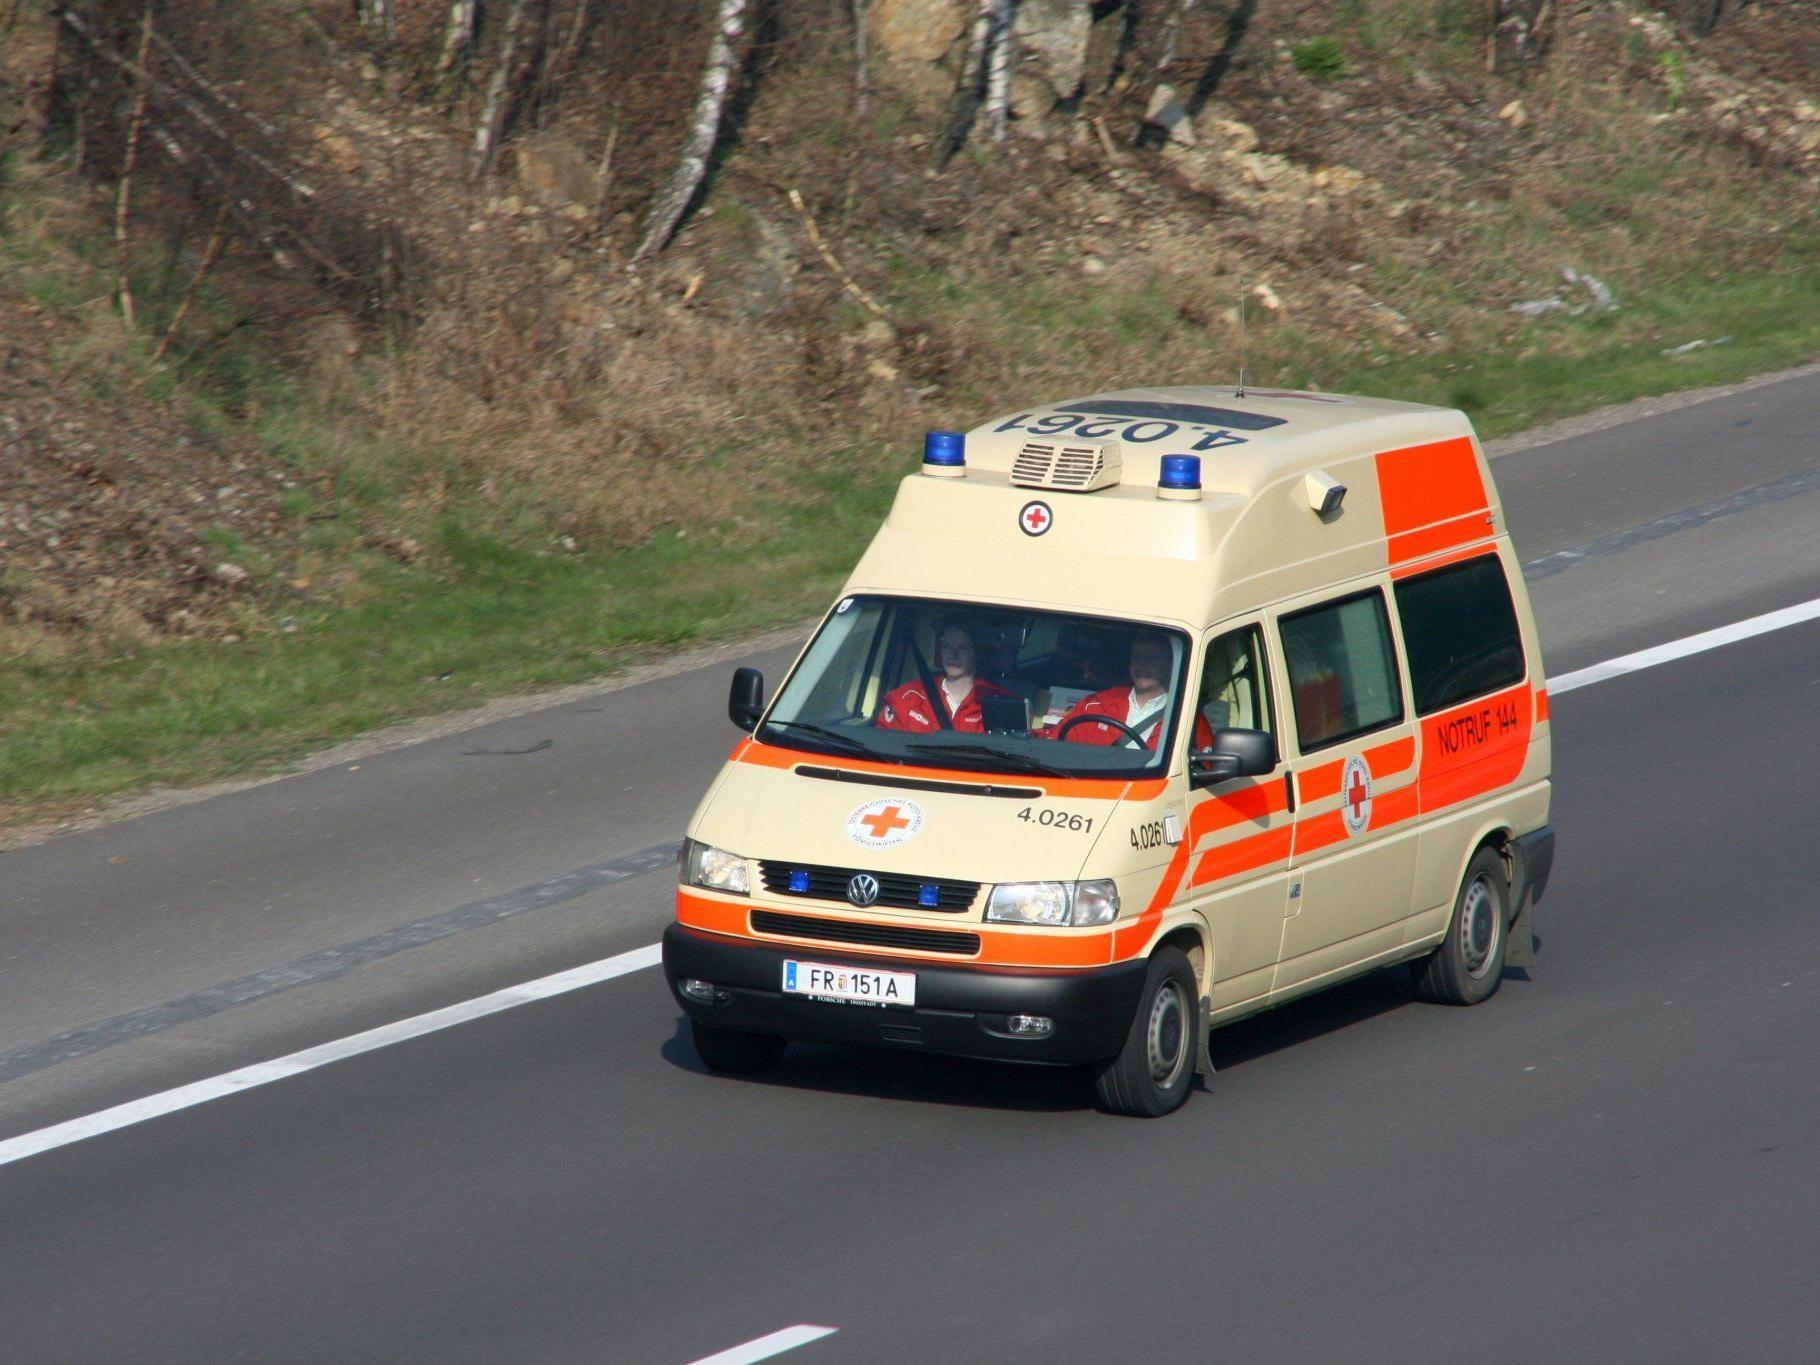 52-Jähriger verlor Fingerkuppe bei Unfall in Sägewerk.